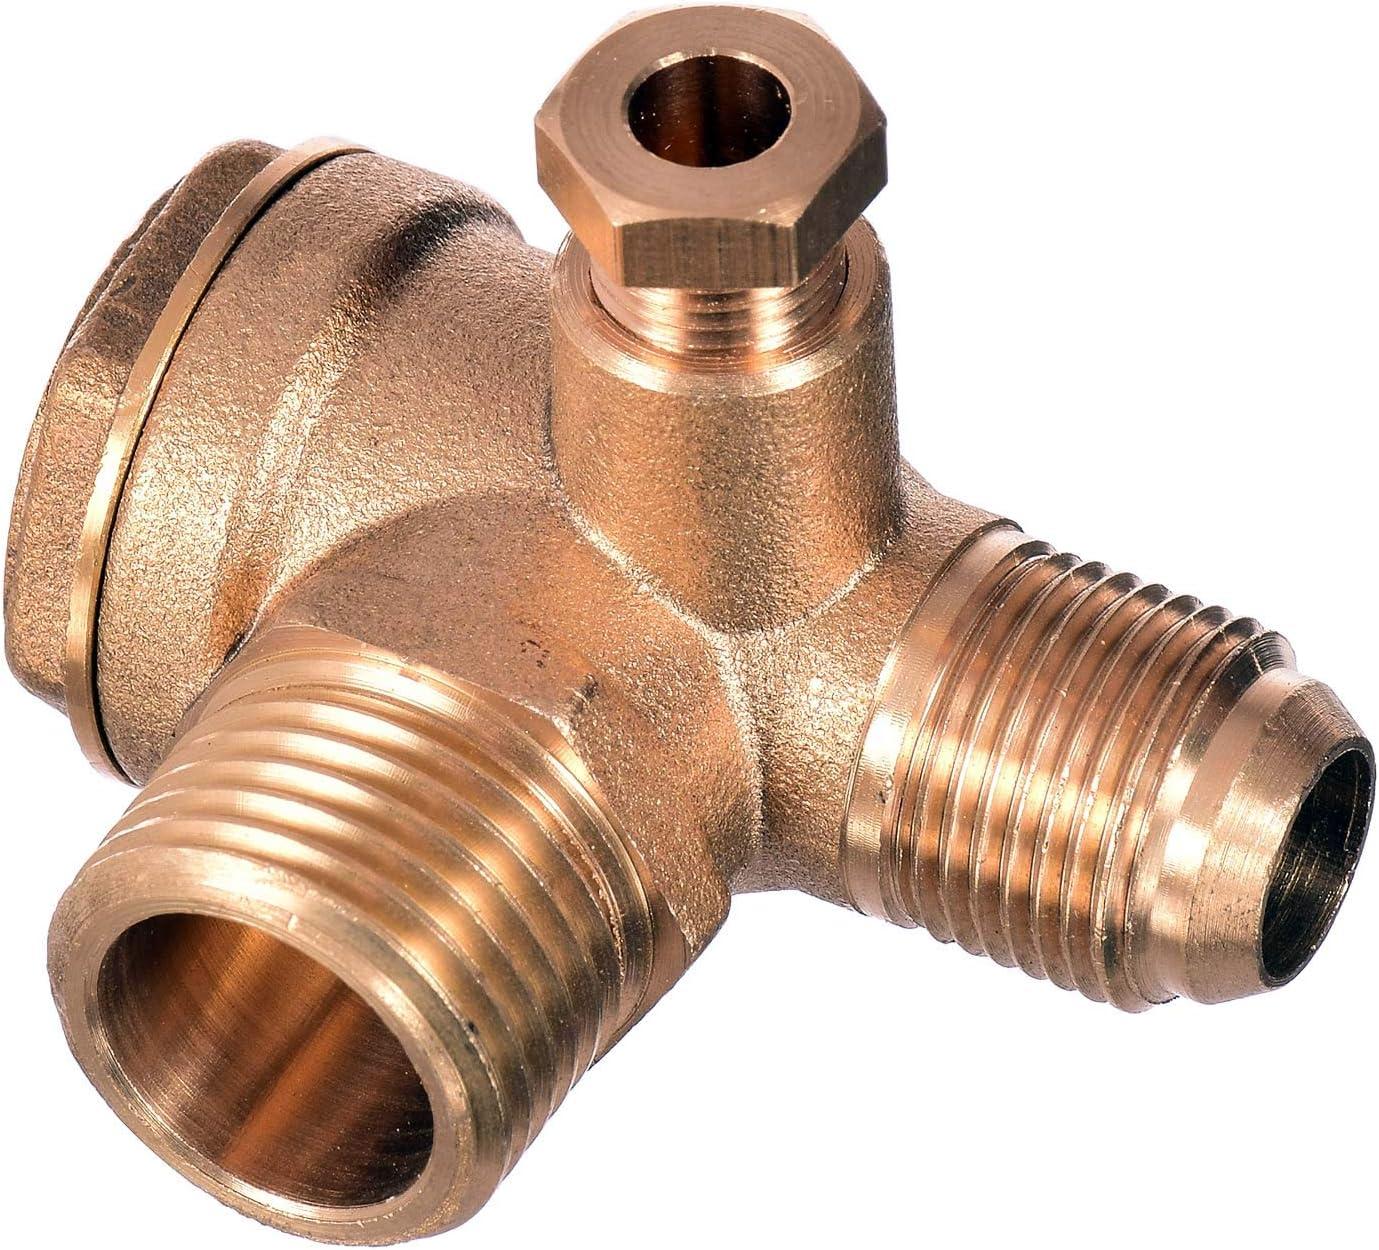 Válvula antirretorno 1/2 x 3/8 (20 mm x 16 mm) compresor de aire ...